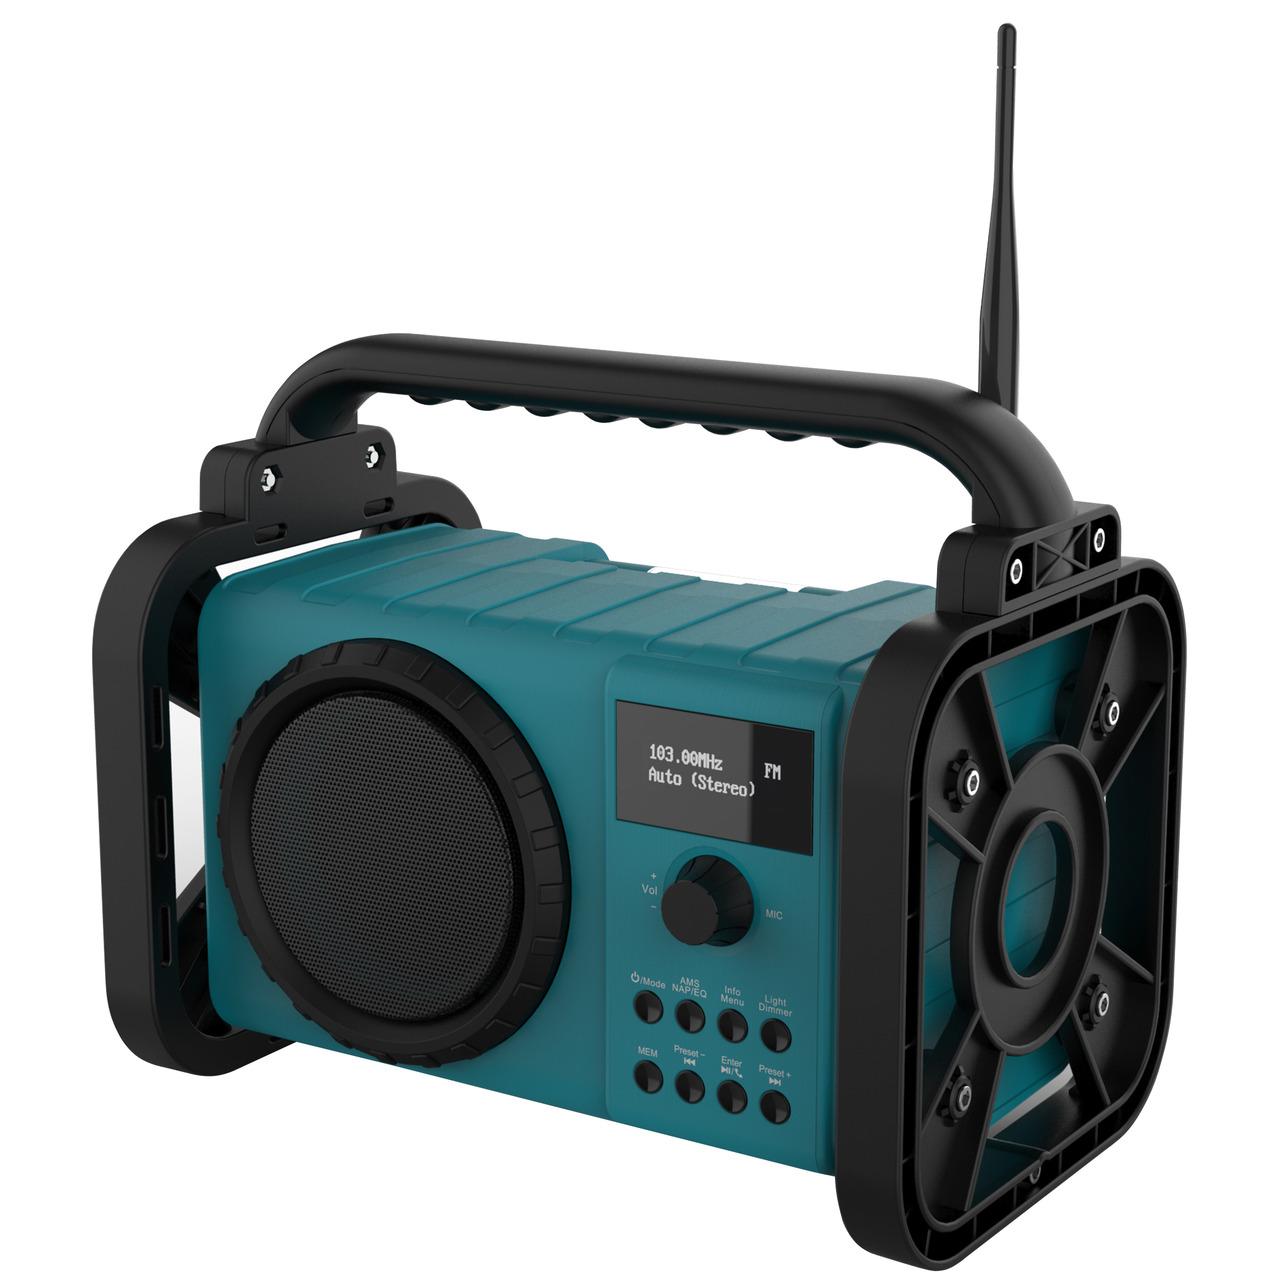 Soundmaster Baustellenradio DAB80- DAB+-UKW- Akku-Betrieb- 5-W-RMS- IP44